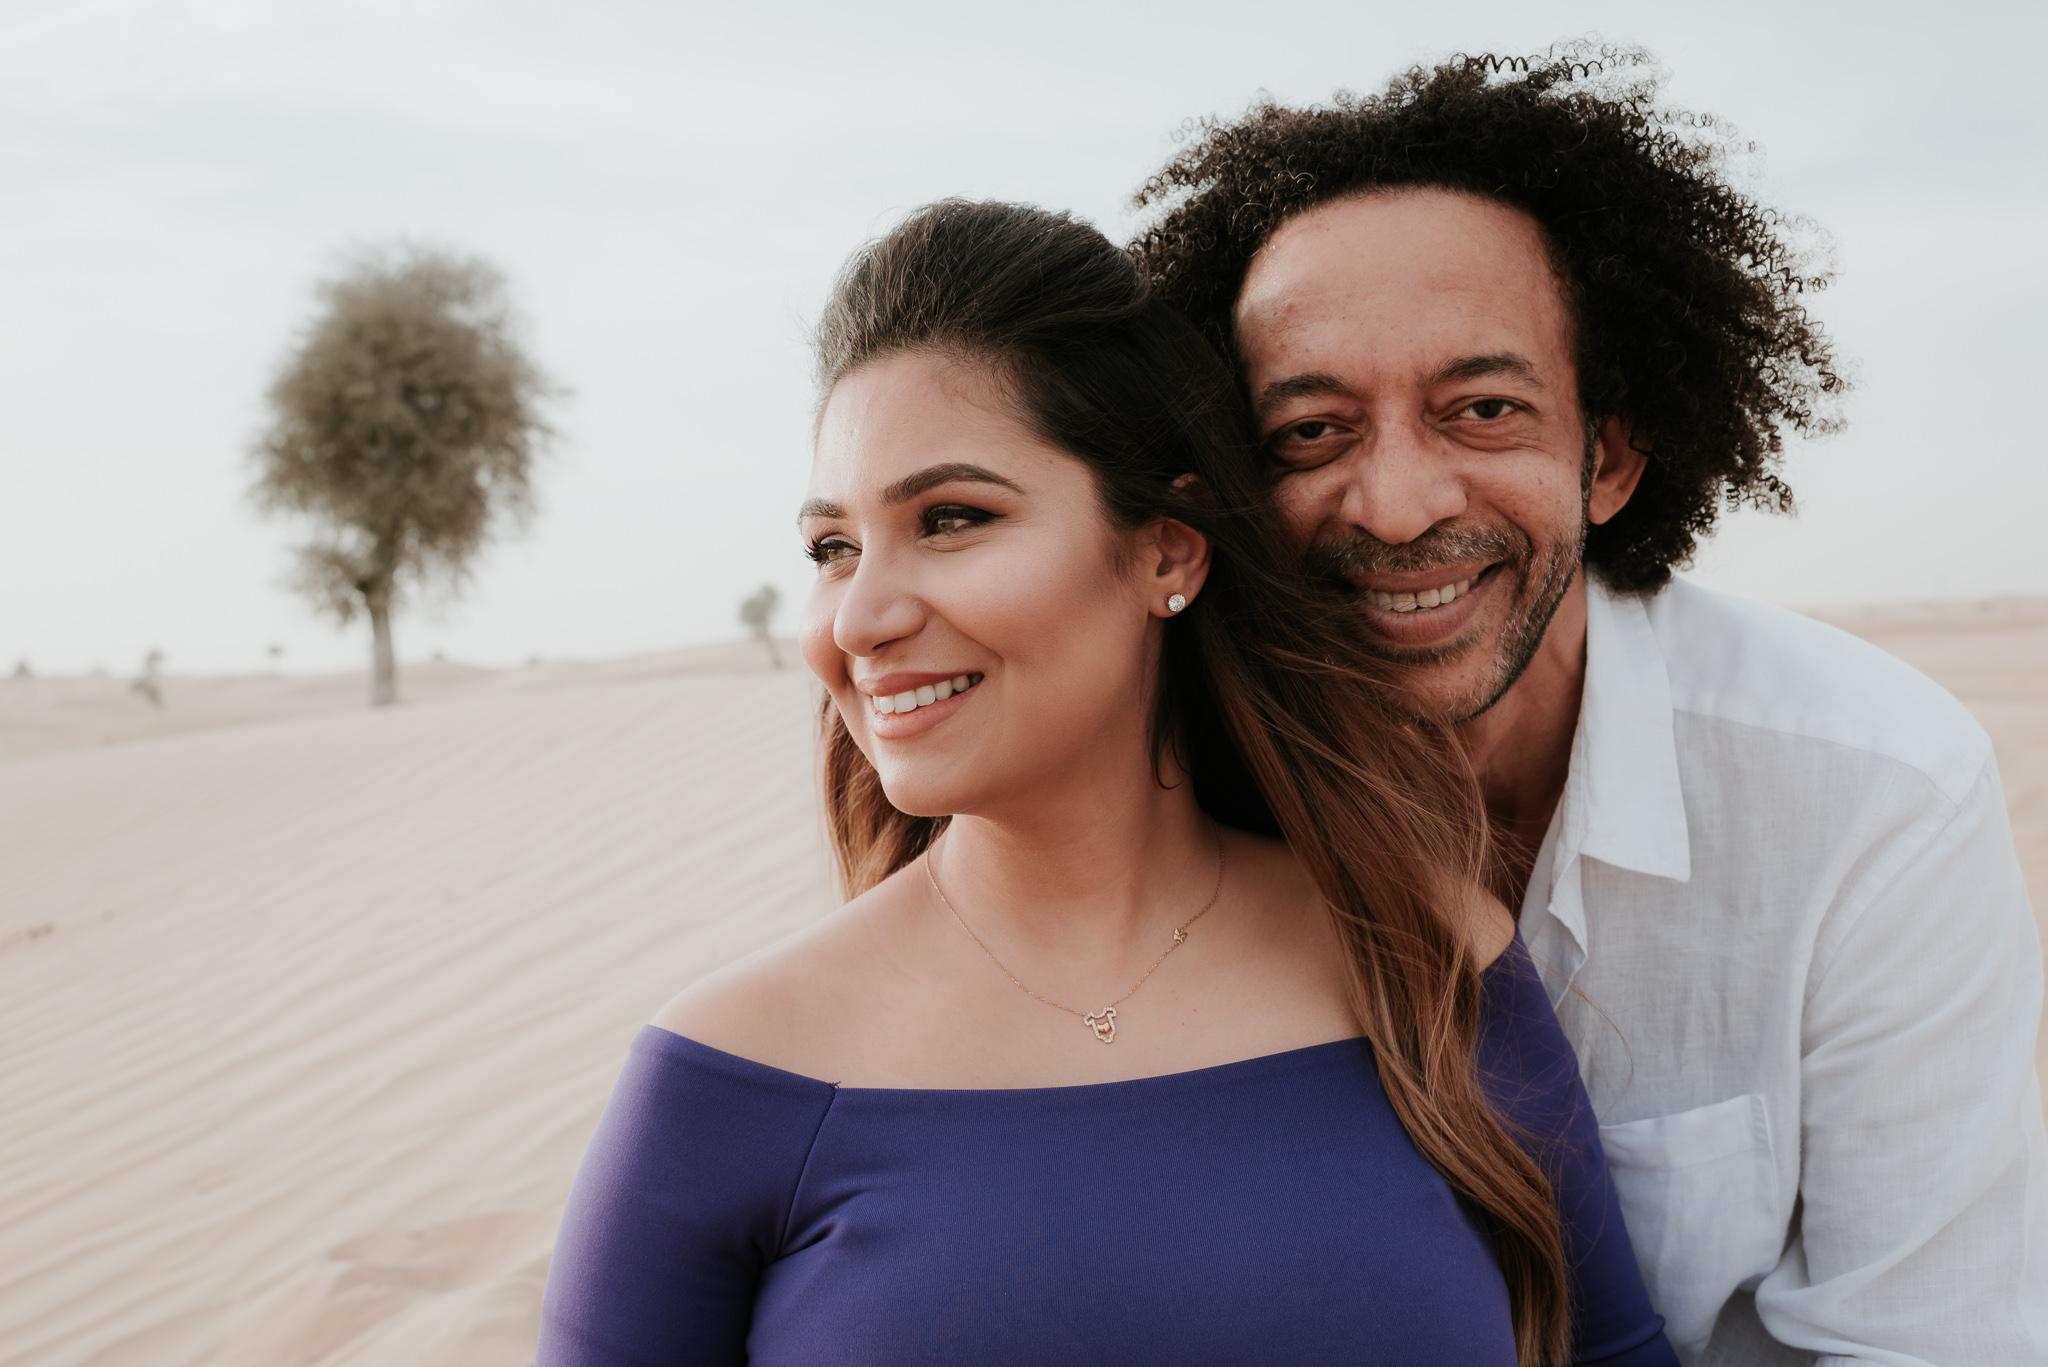 Lana-Photographs-Dubai-Maternity-Photographer-FatimaE-PSLR-14.jpg